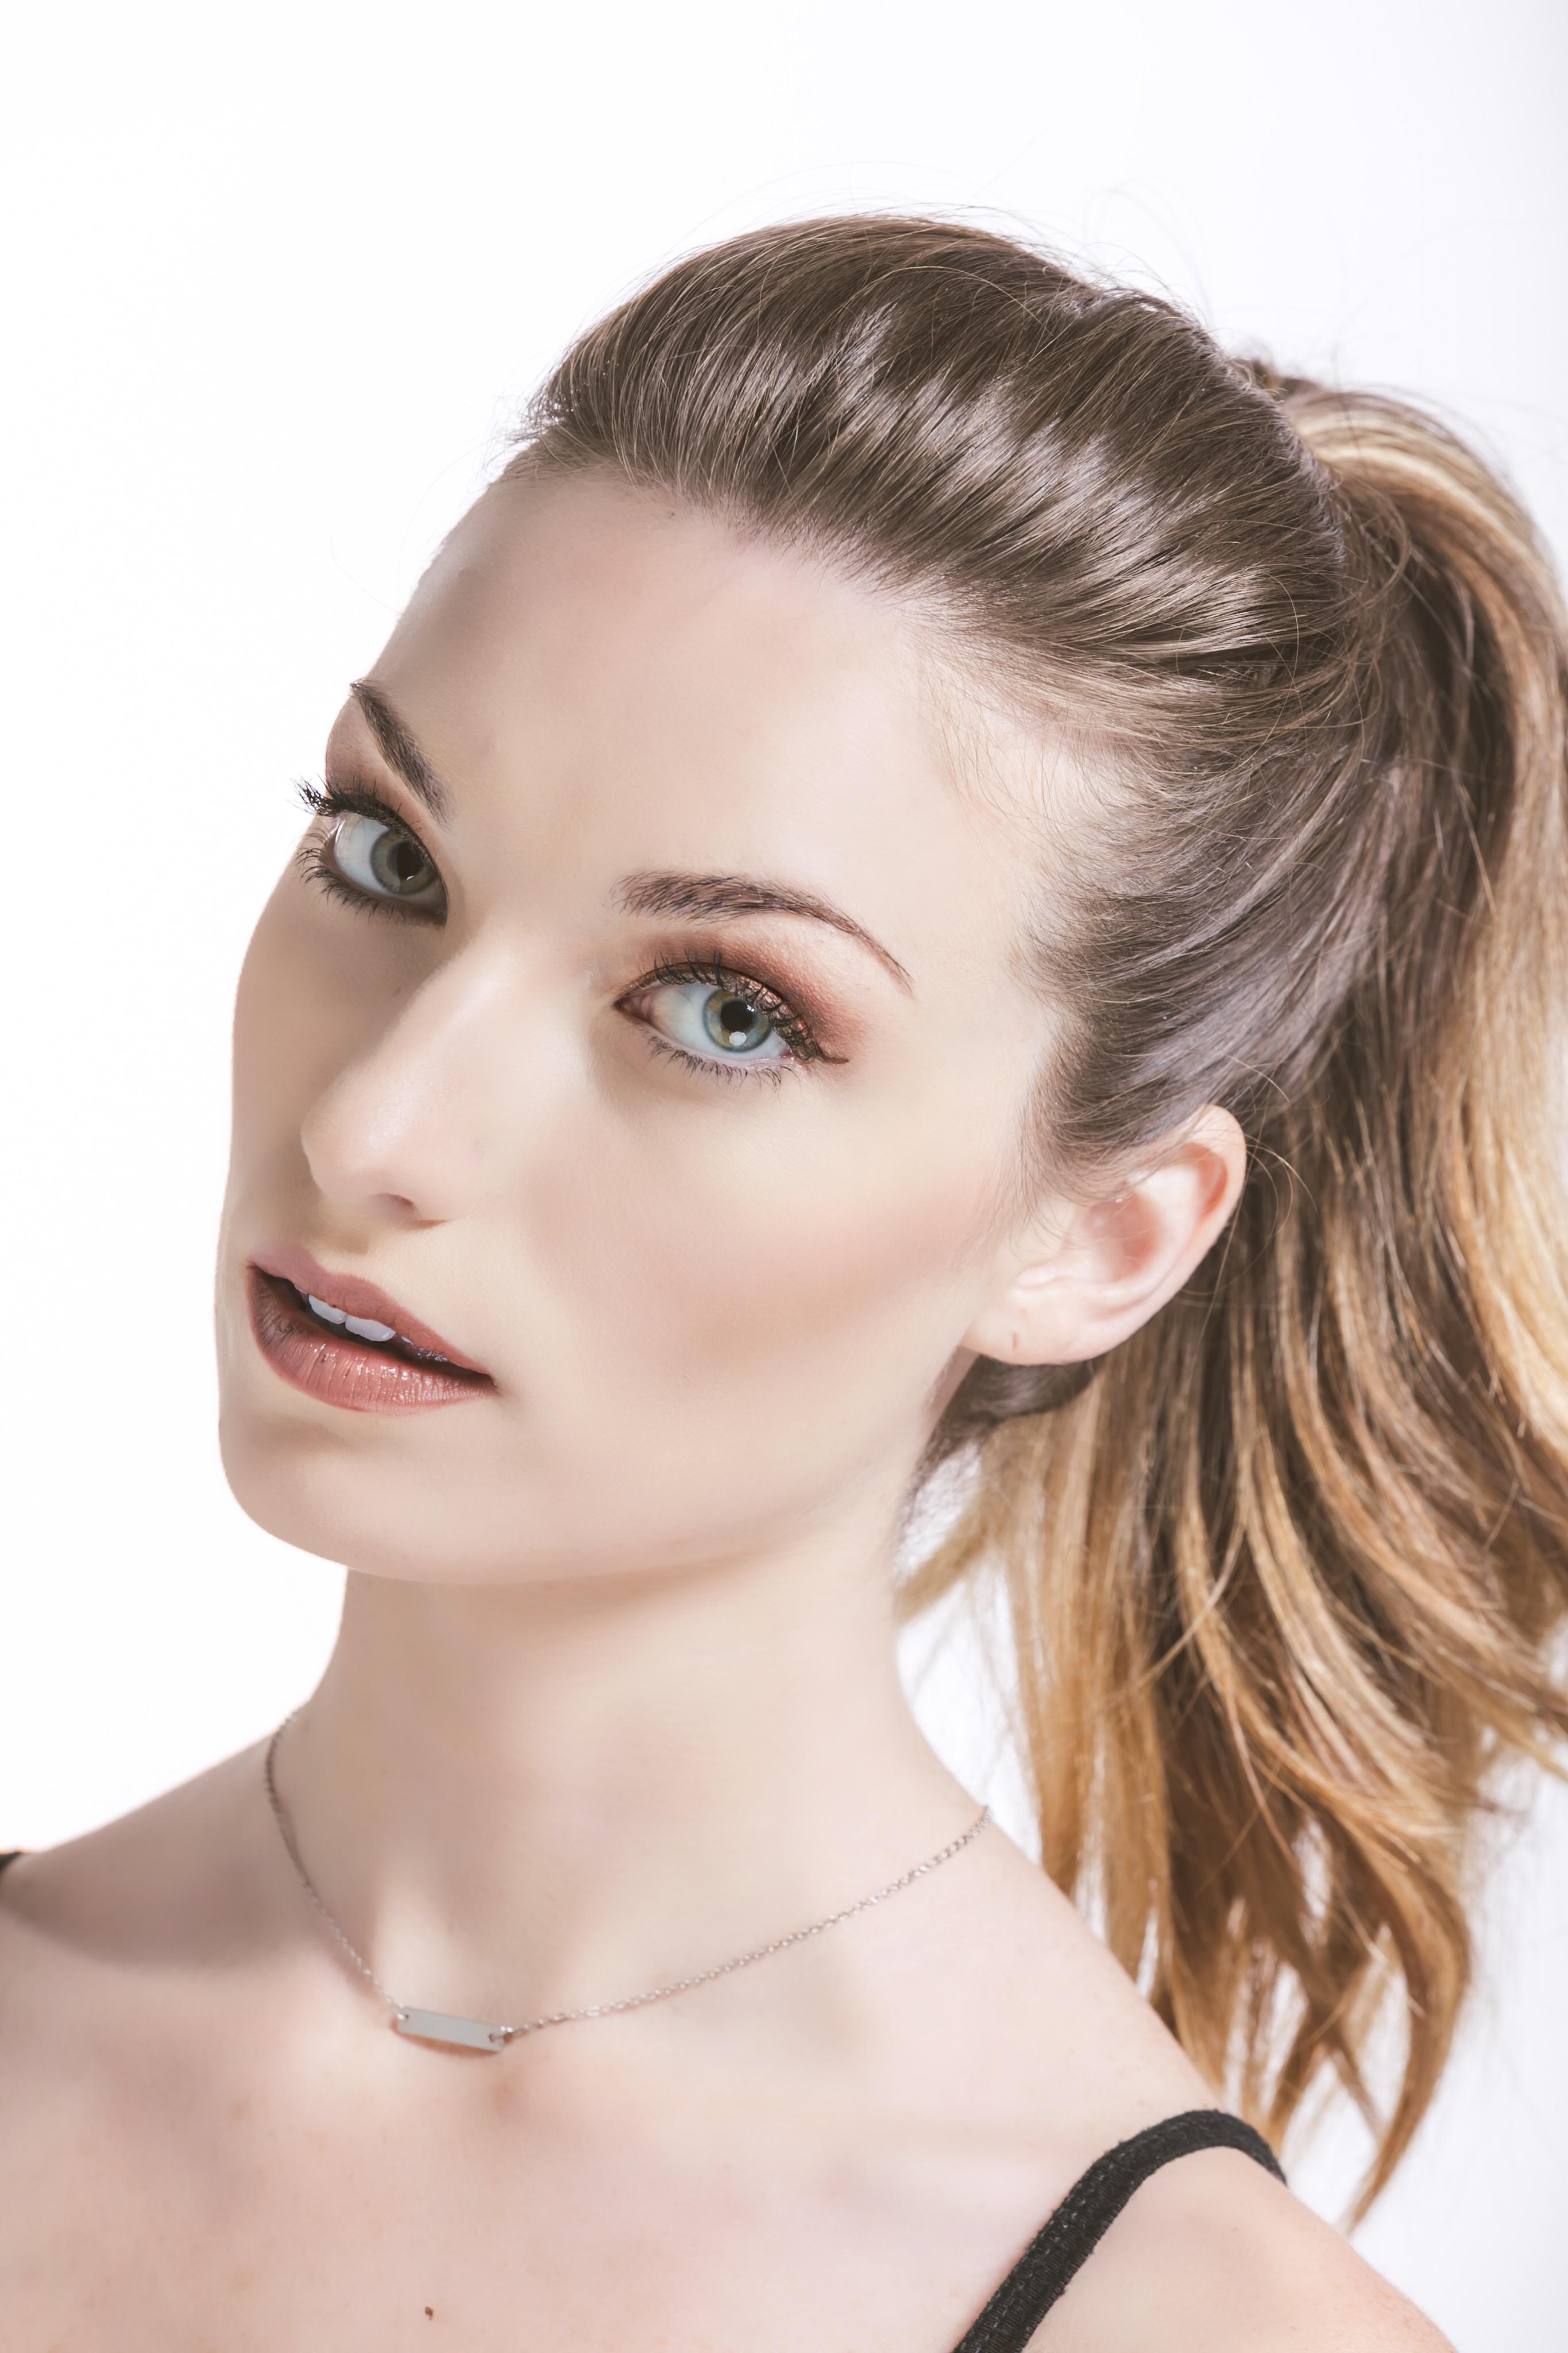 Model: Hayley